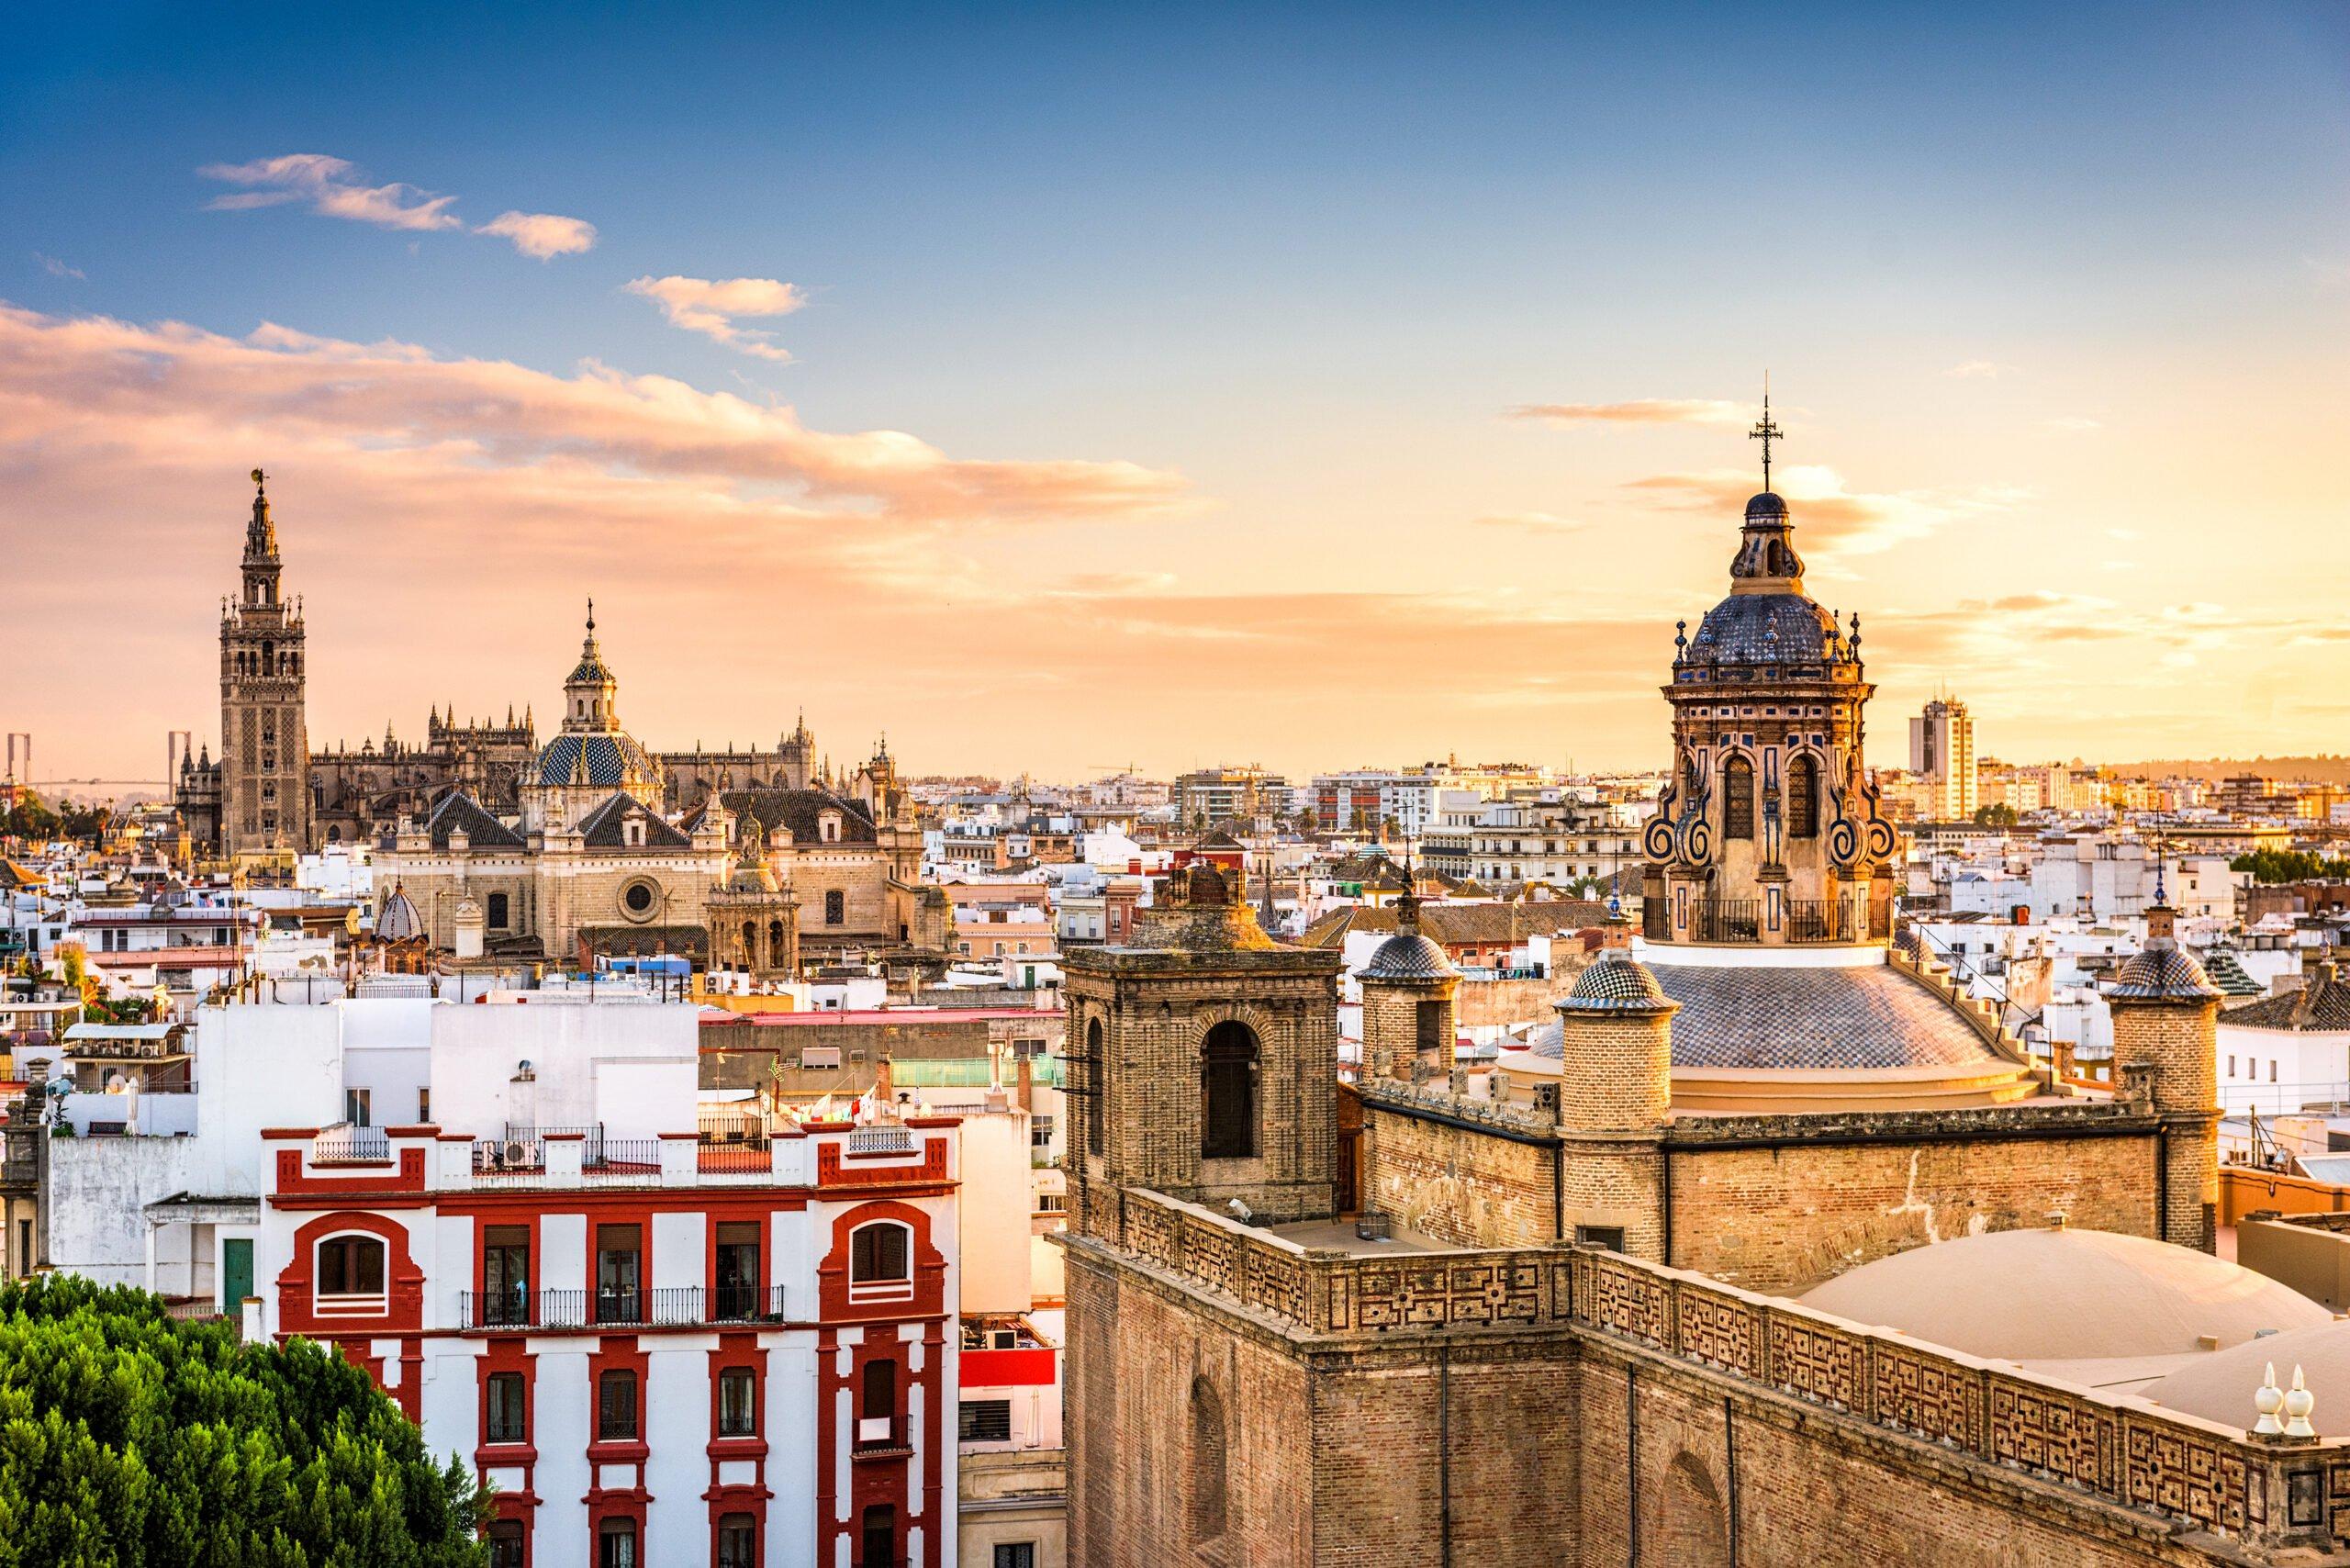 Marvel The Beautiful Skyline Of Seville On The Insider Seville City Tour